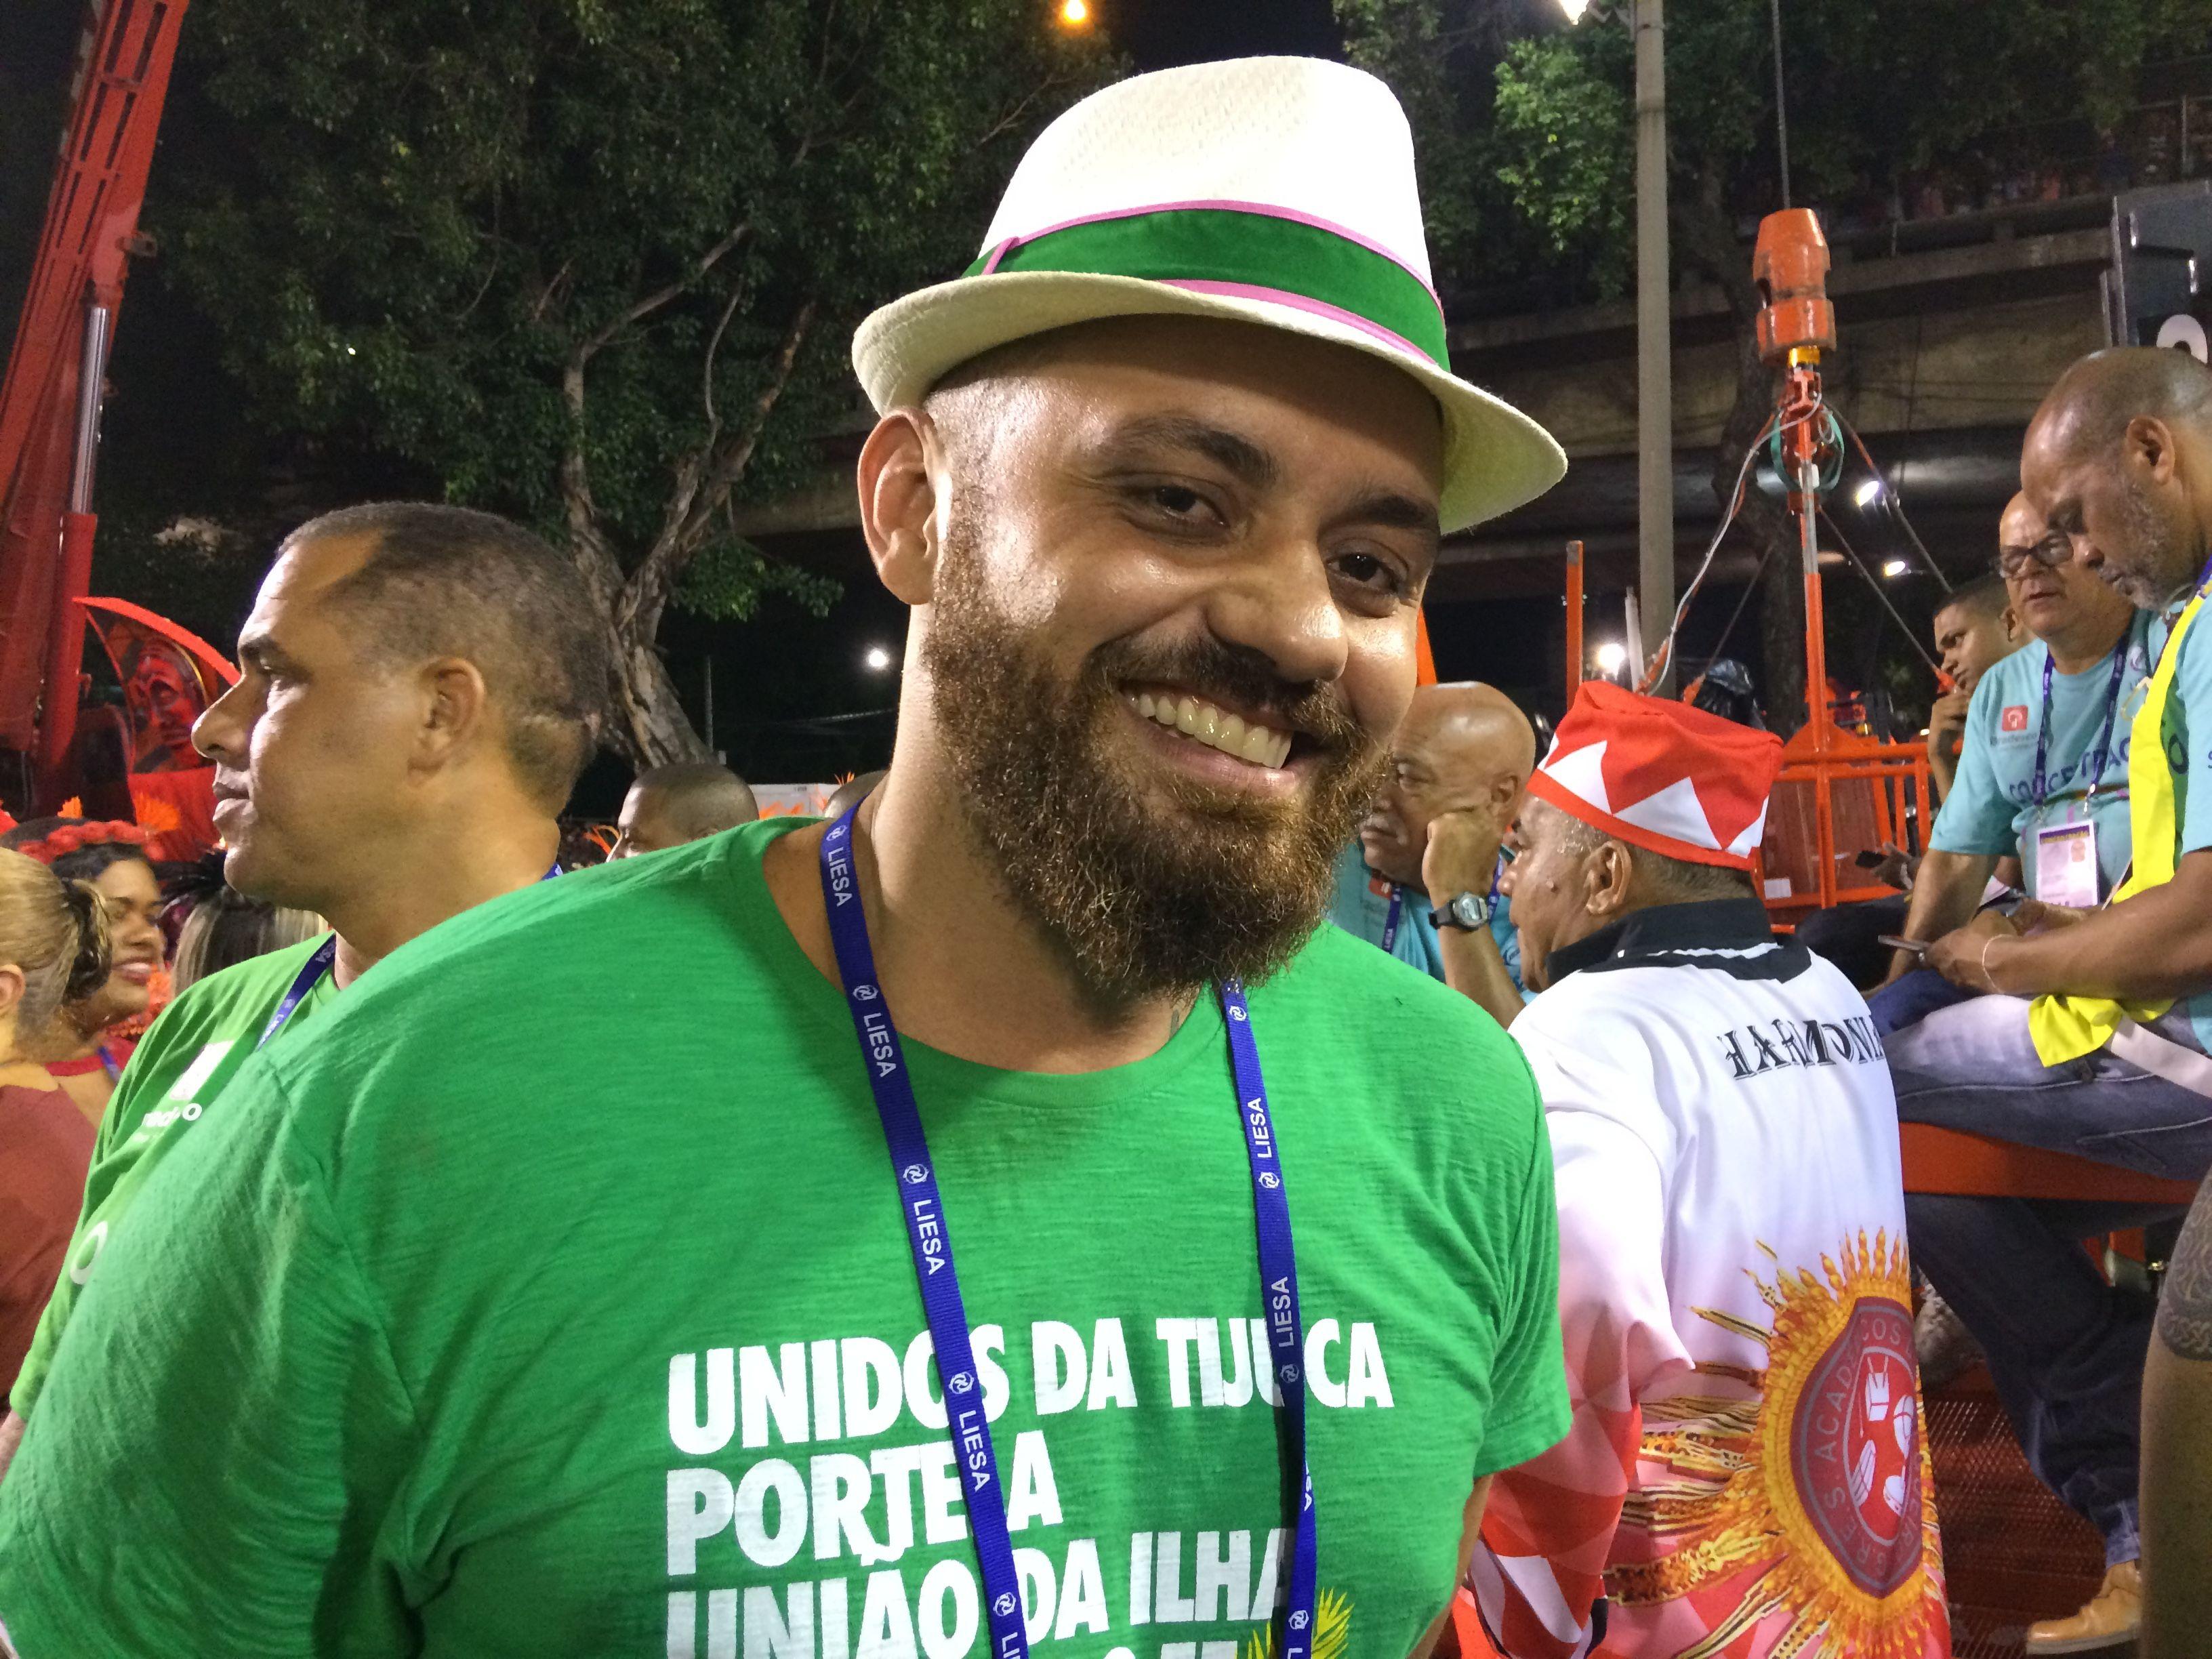 carnavalesco mangueira  Leandro Vieira